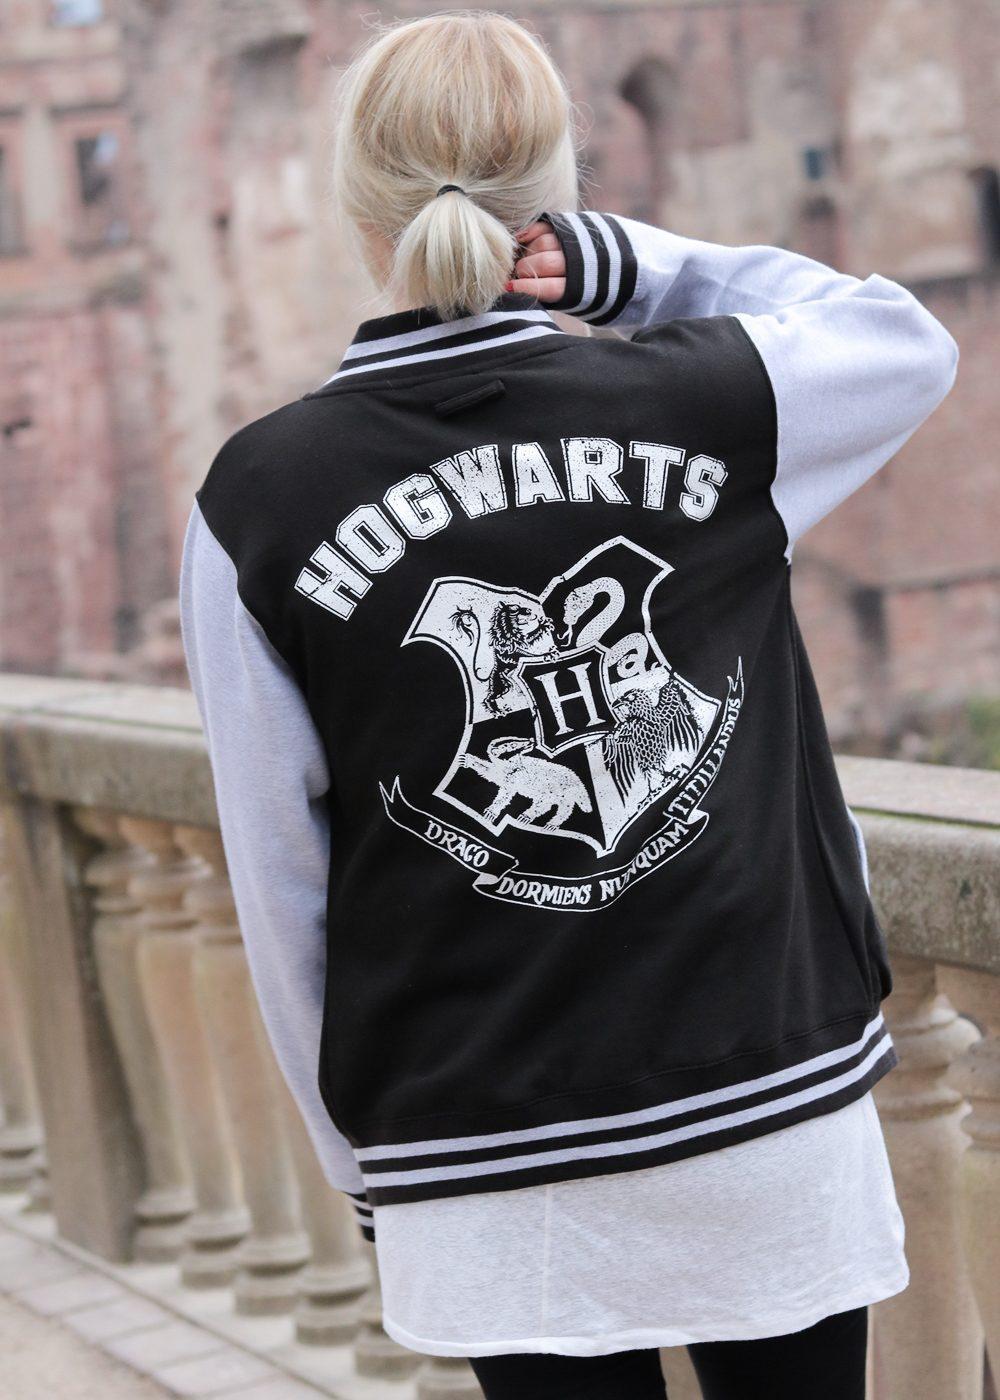 fashionblogger-outfit-emp-hogwarts-collegajcke-converse-lederchucks-skinnyjeans-14-von-20